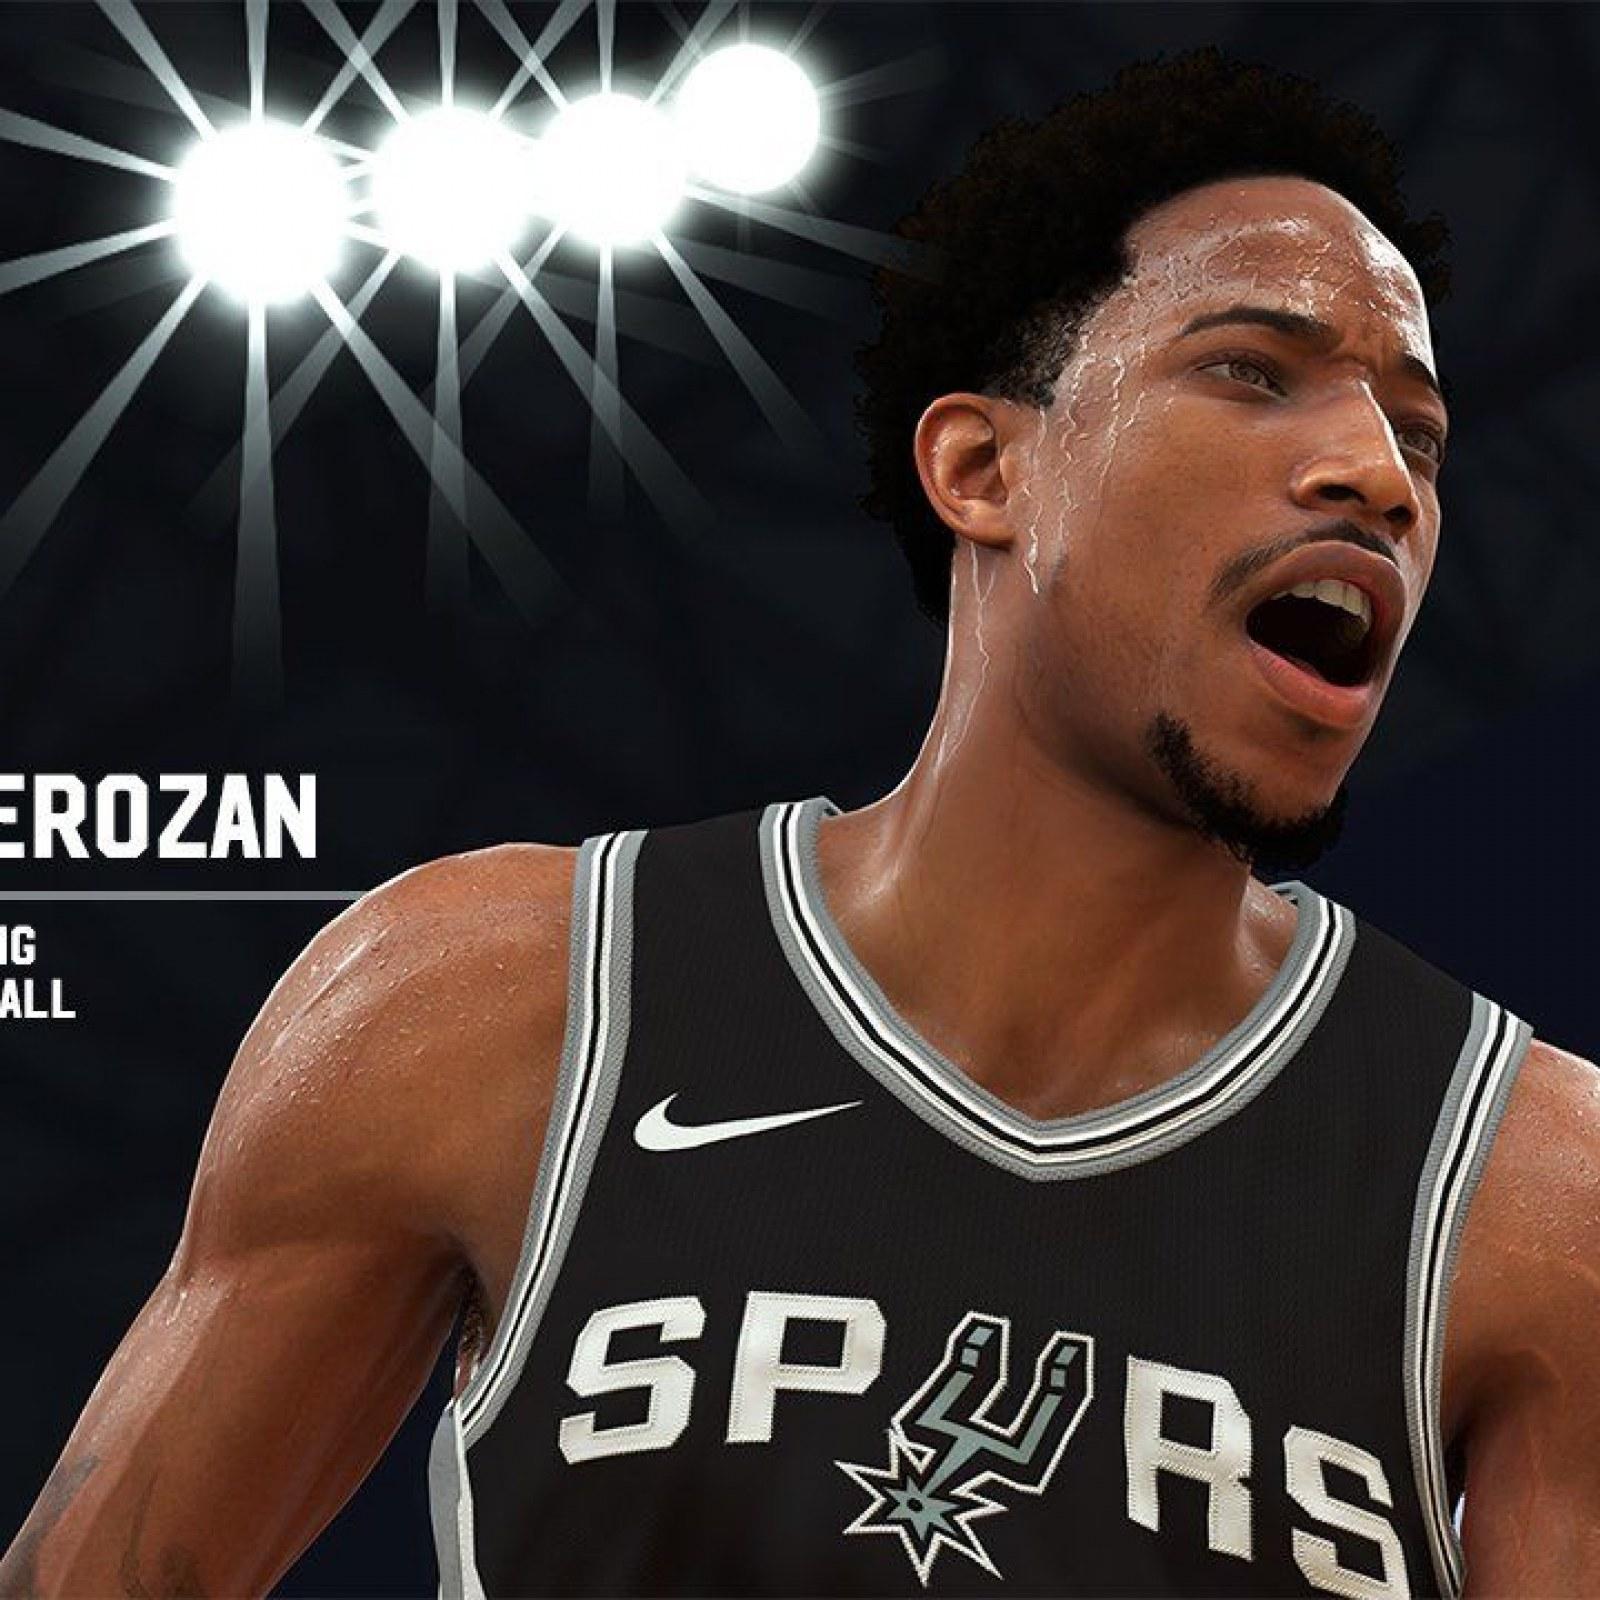 NBA 2K19' Player Ratings List: LeBron James, DeMar DeRozan